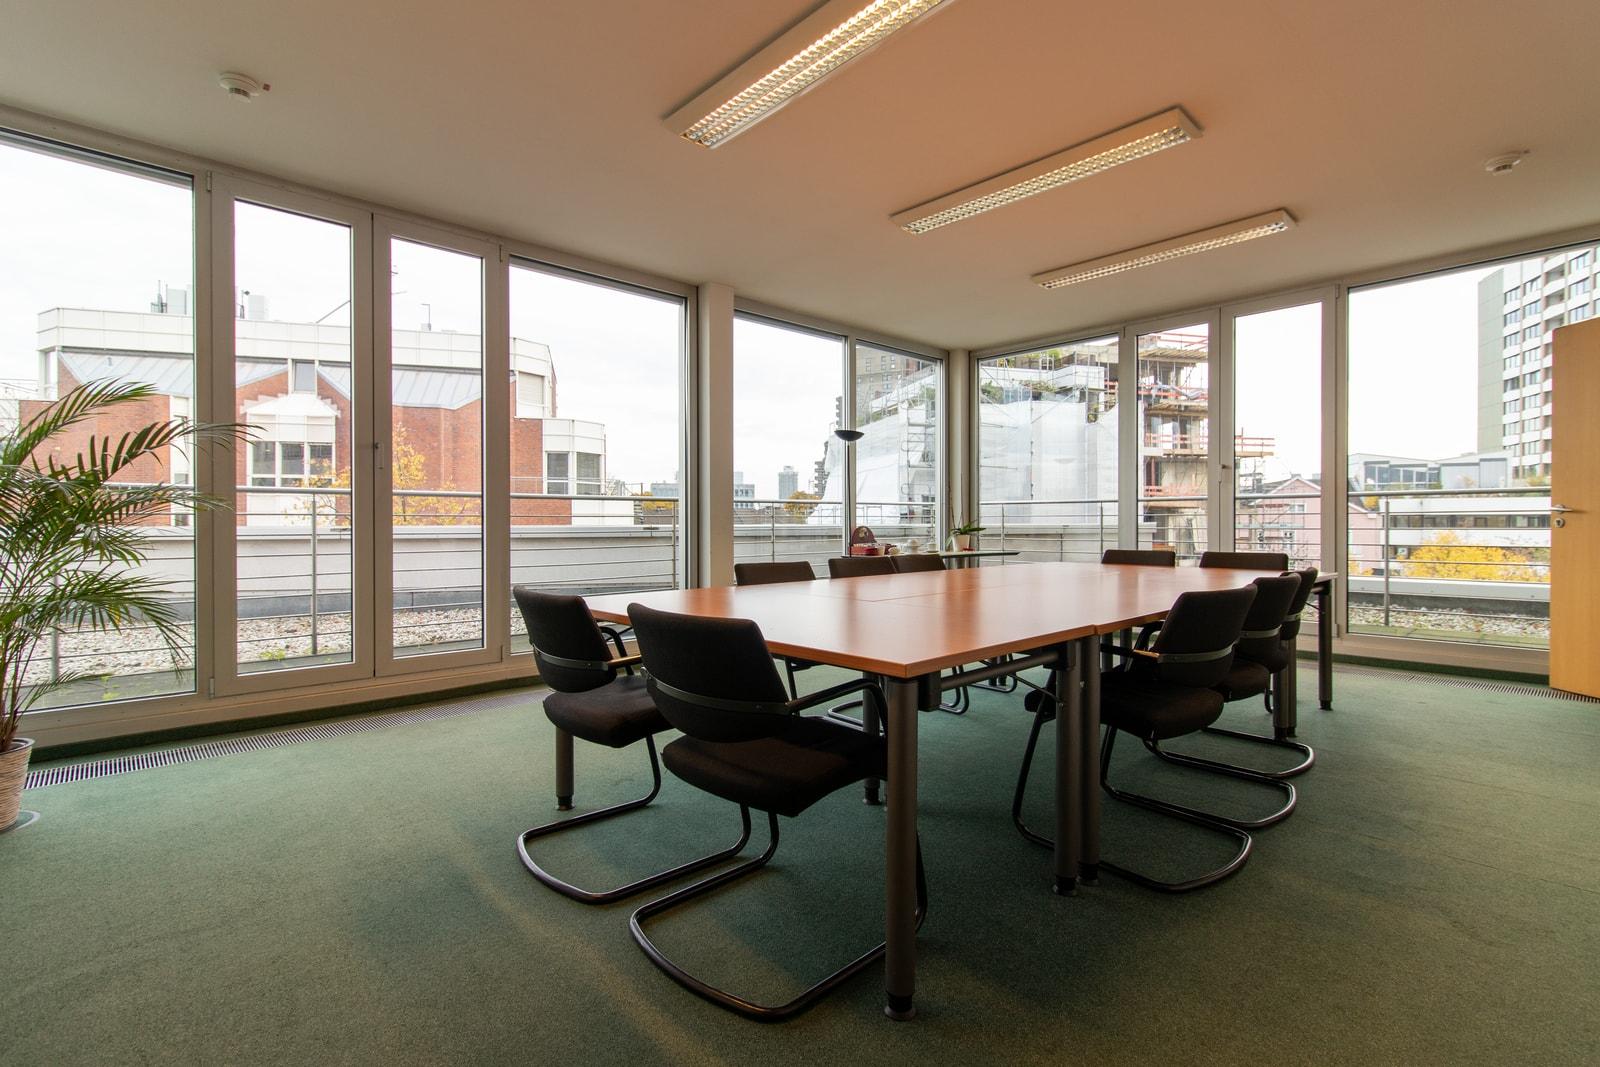 meeting room 2 Theodor-Heuss-Ring 23